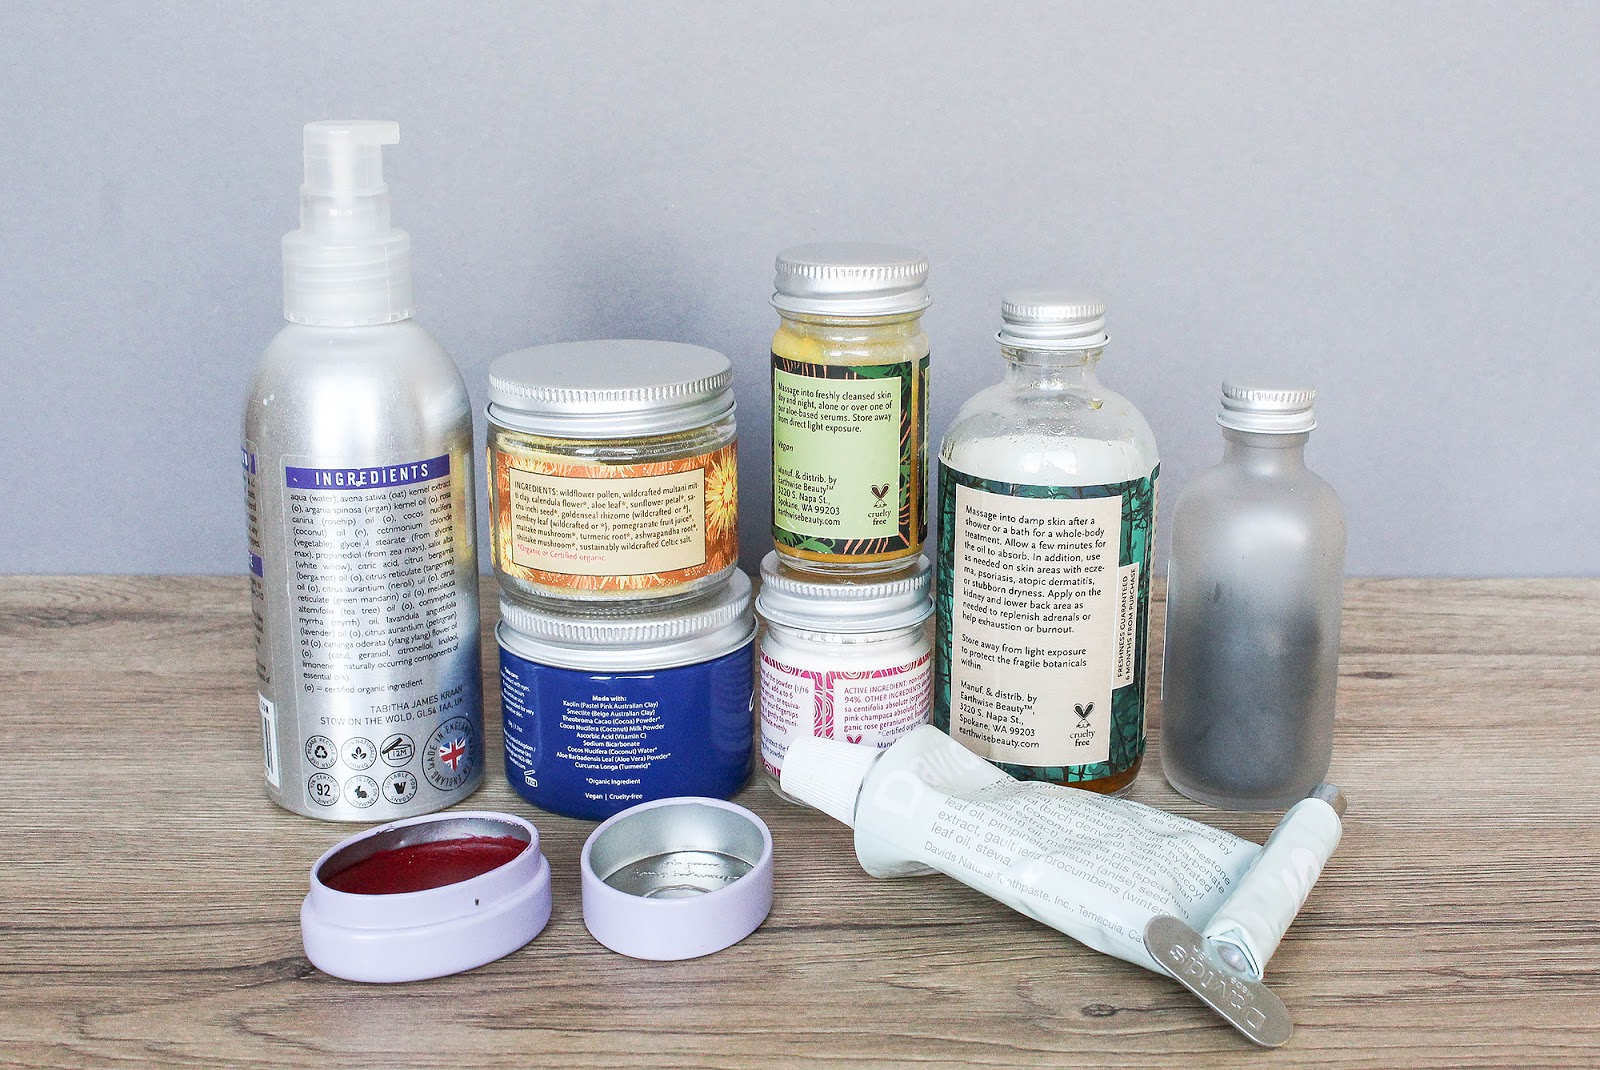 Glass packaging, aluminium lids. Eco-friendly packaging.